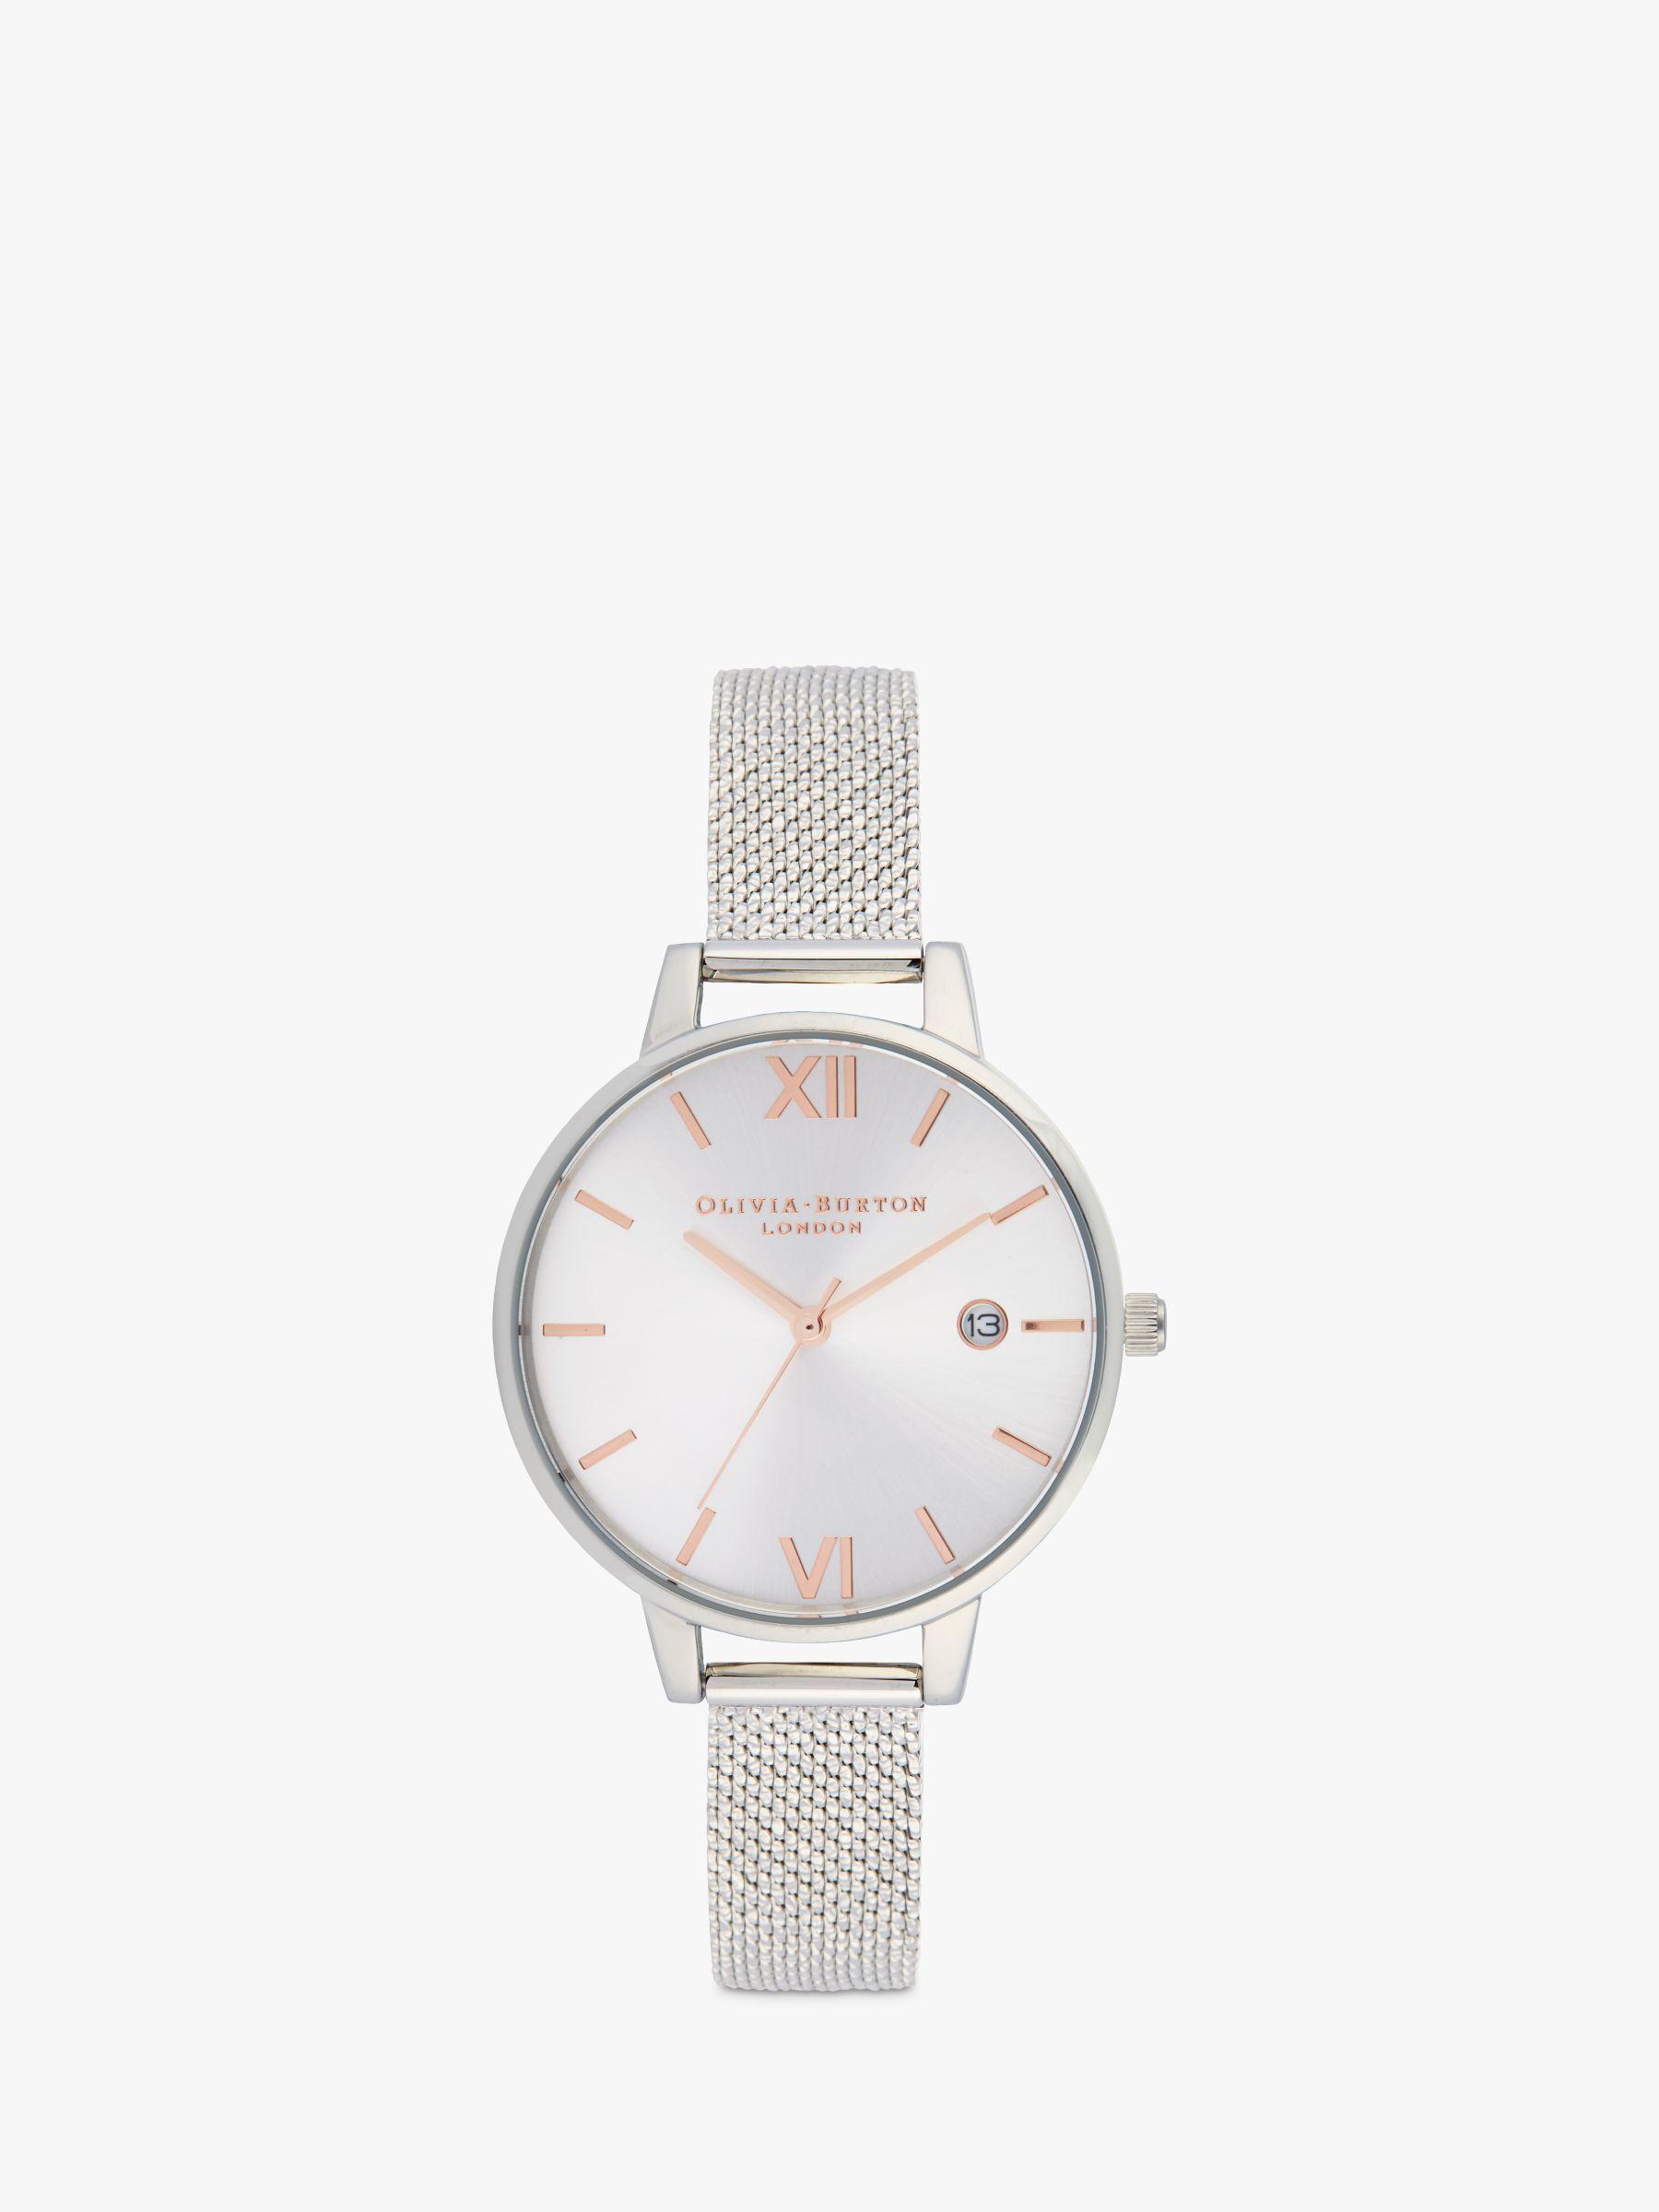 Olivia Burton Olivia Burton OB16DE01 Women's Demi Date Mesh Bracelet Strap Watch, Silver/White